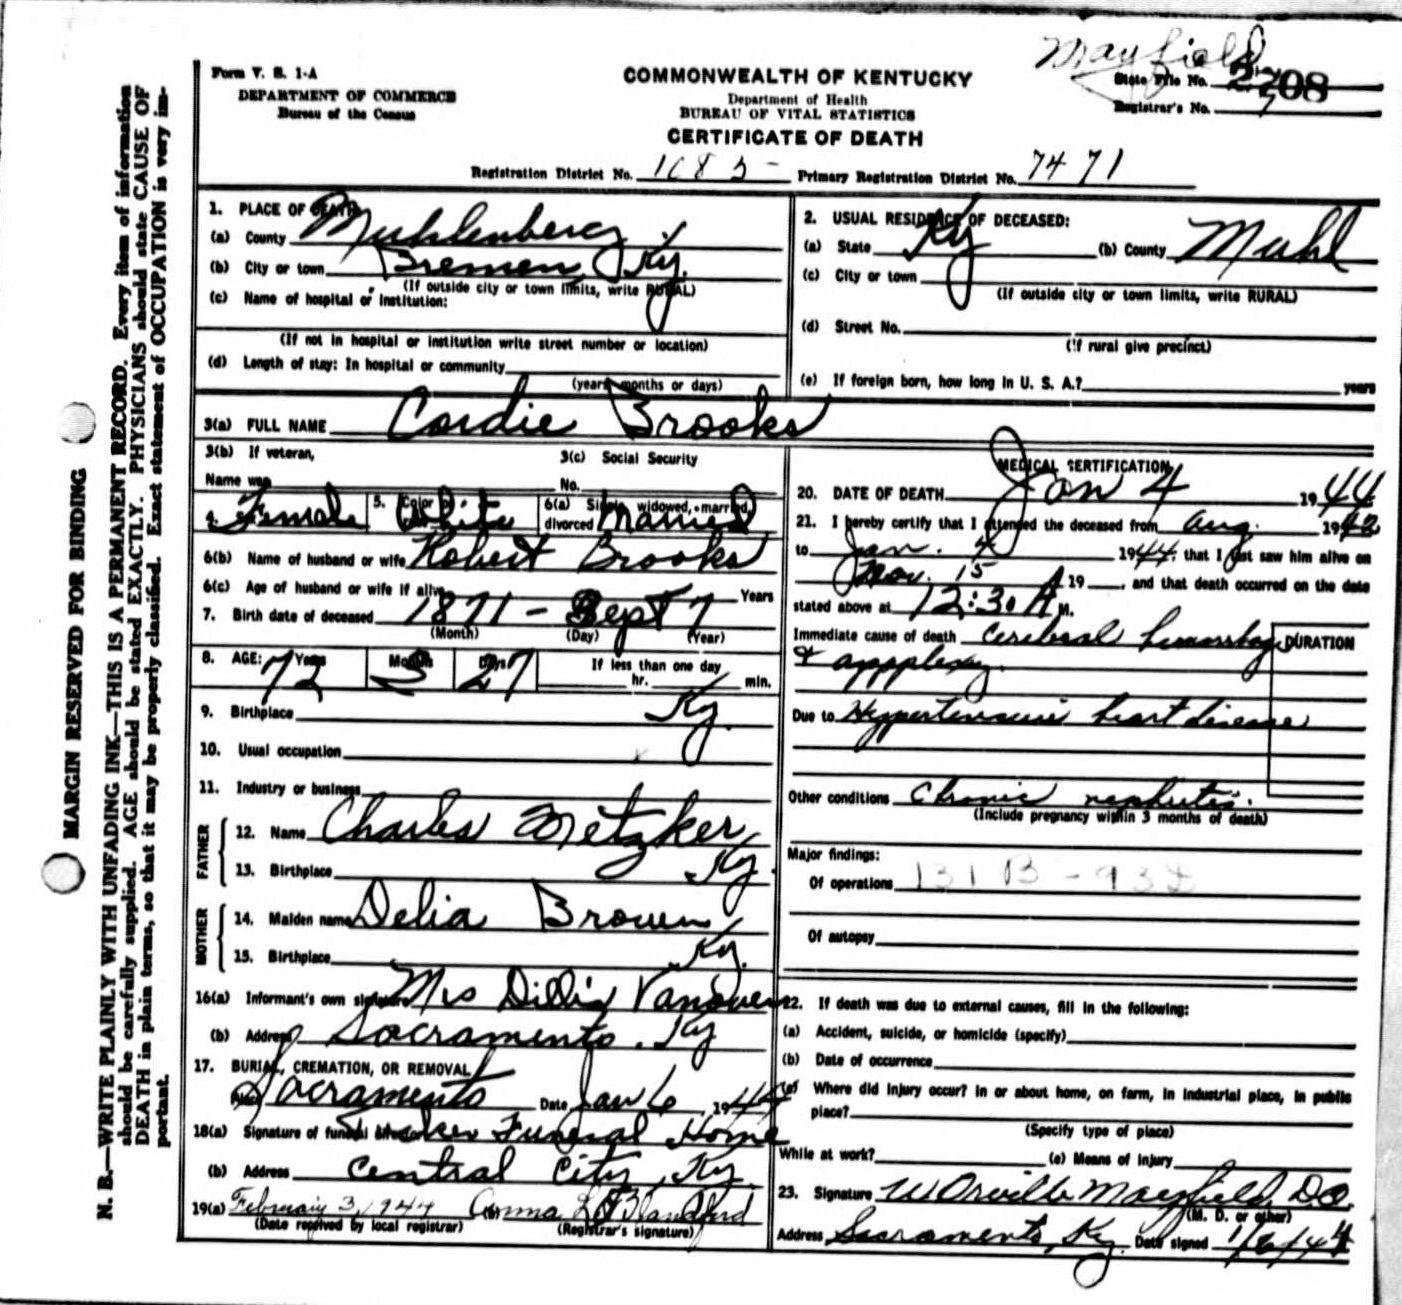 Death certificates br kentucky death certificate 2708 cordie brooks 1871 1944 robert brooks charles metzker delia brown dillia vanover bremen sacramento muhlenberg 1betcityfo Choice Image